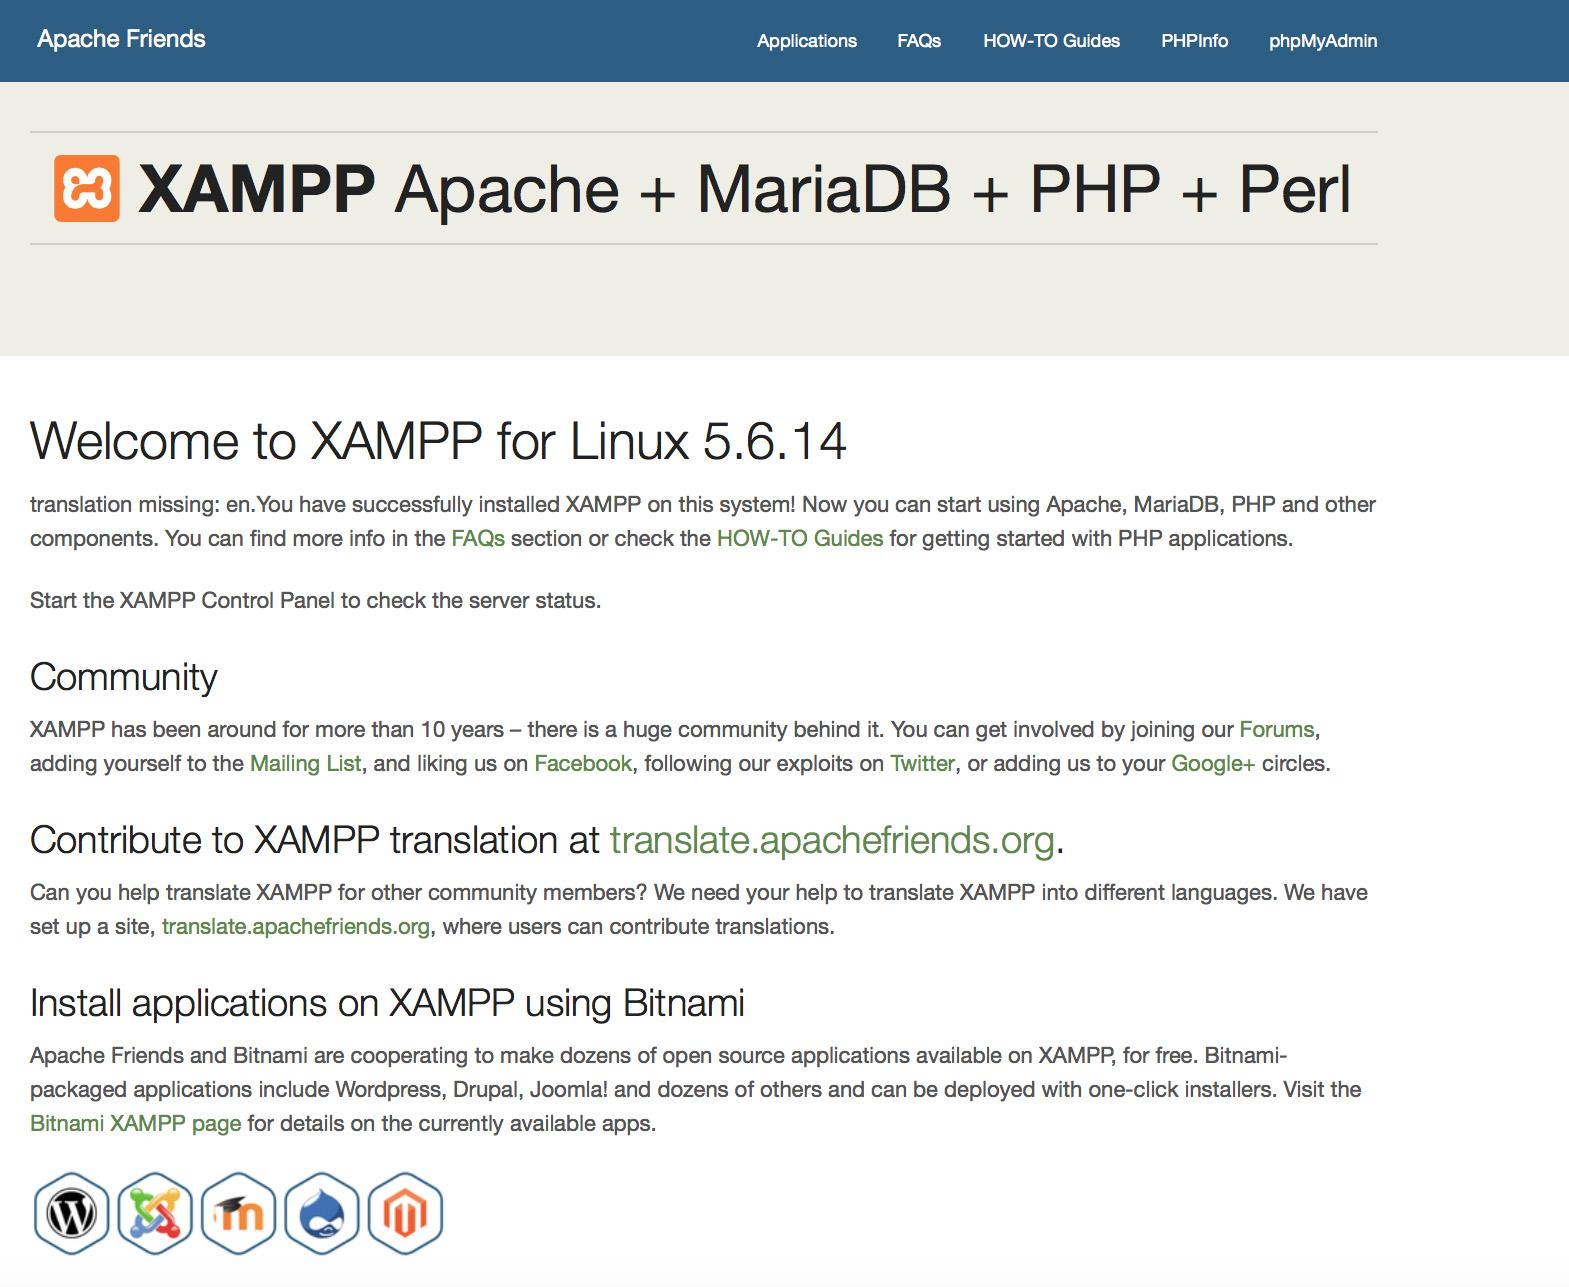 XAMPP FAQs for Linux